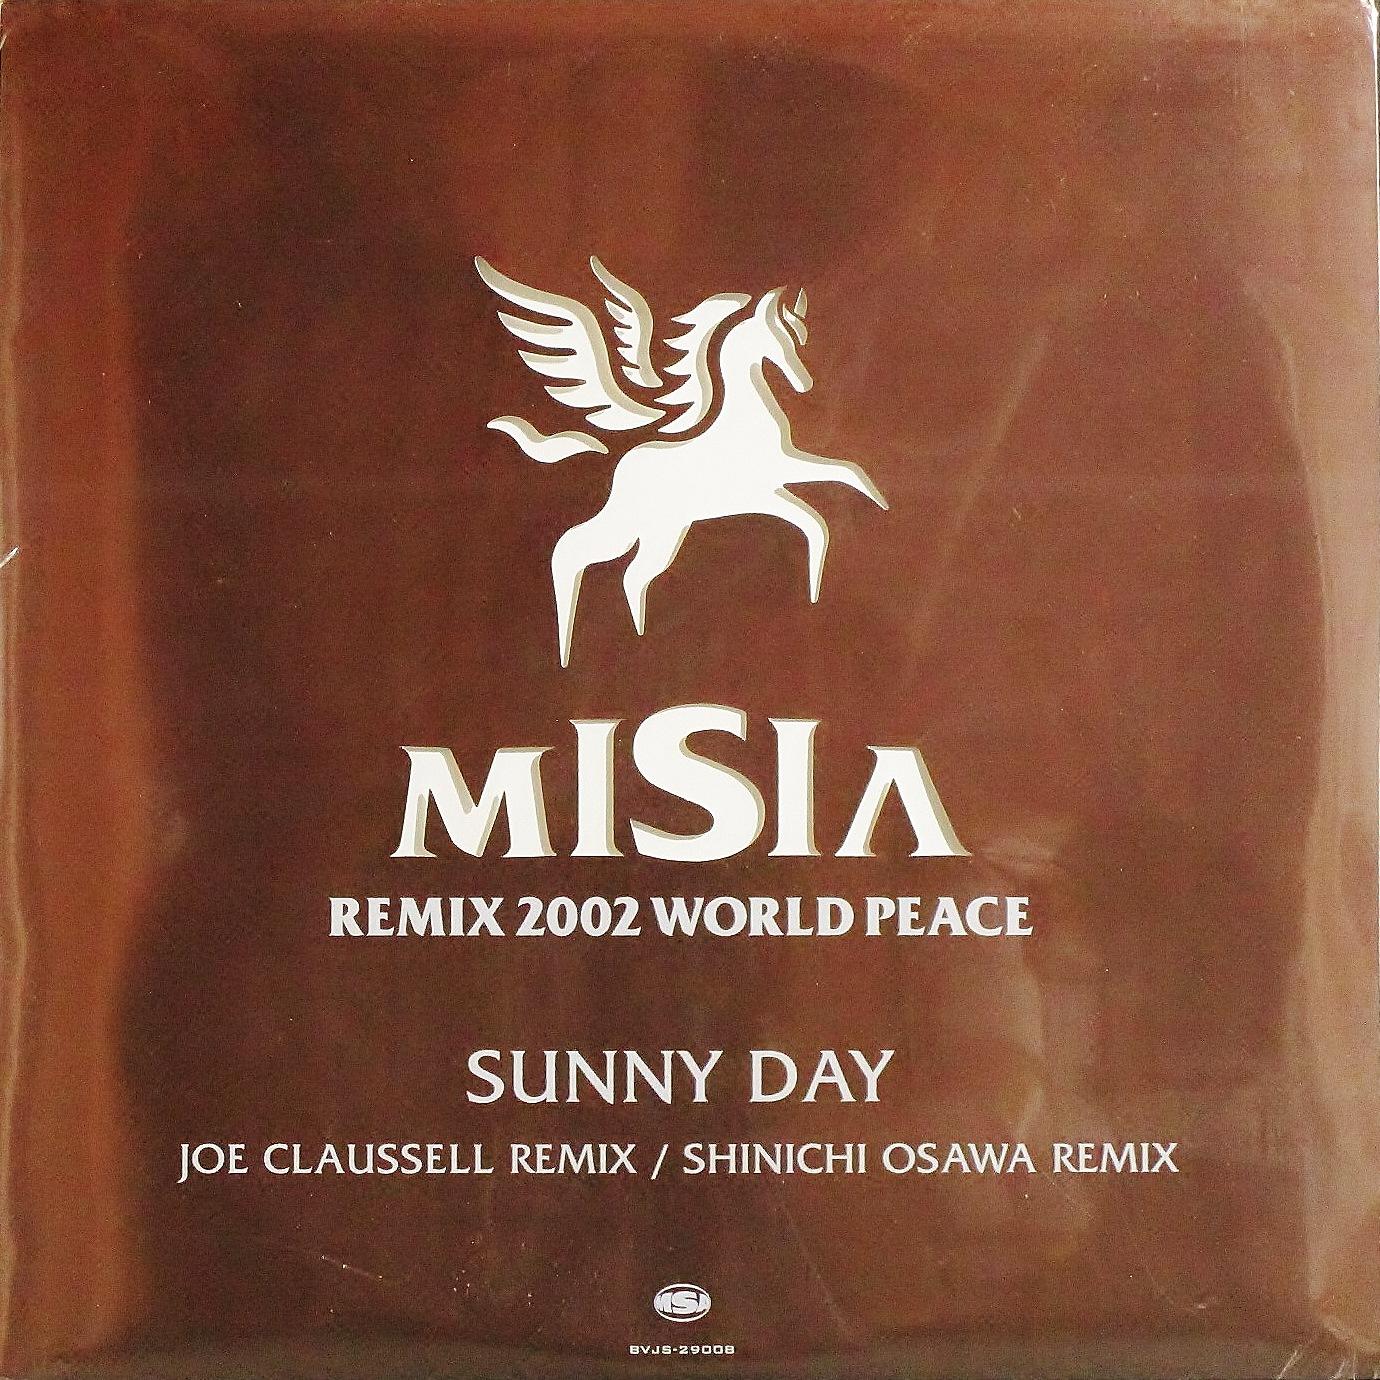 Misia ミーシャ / Sunny Day 未開封